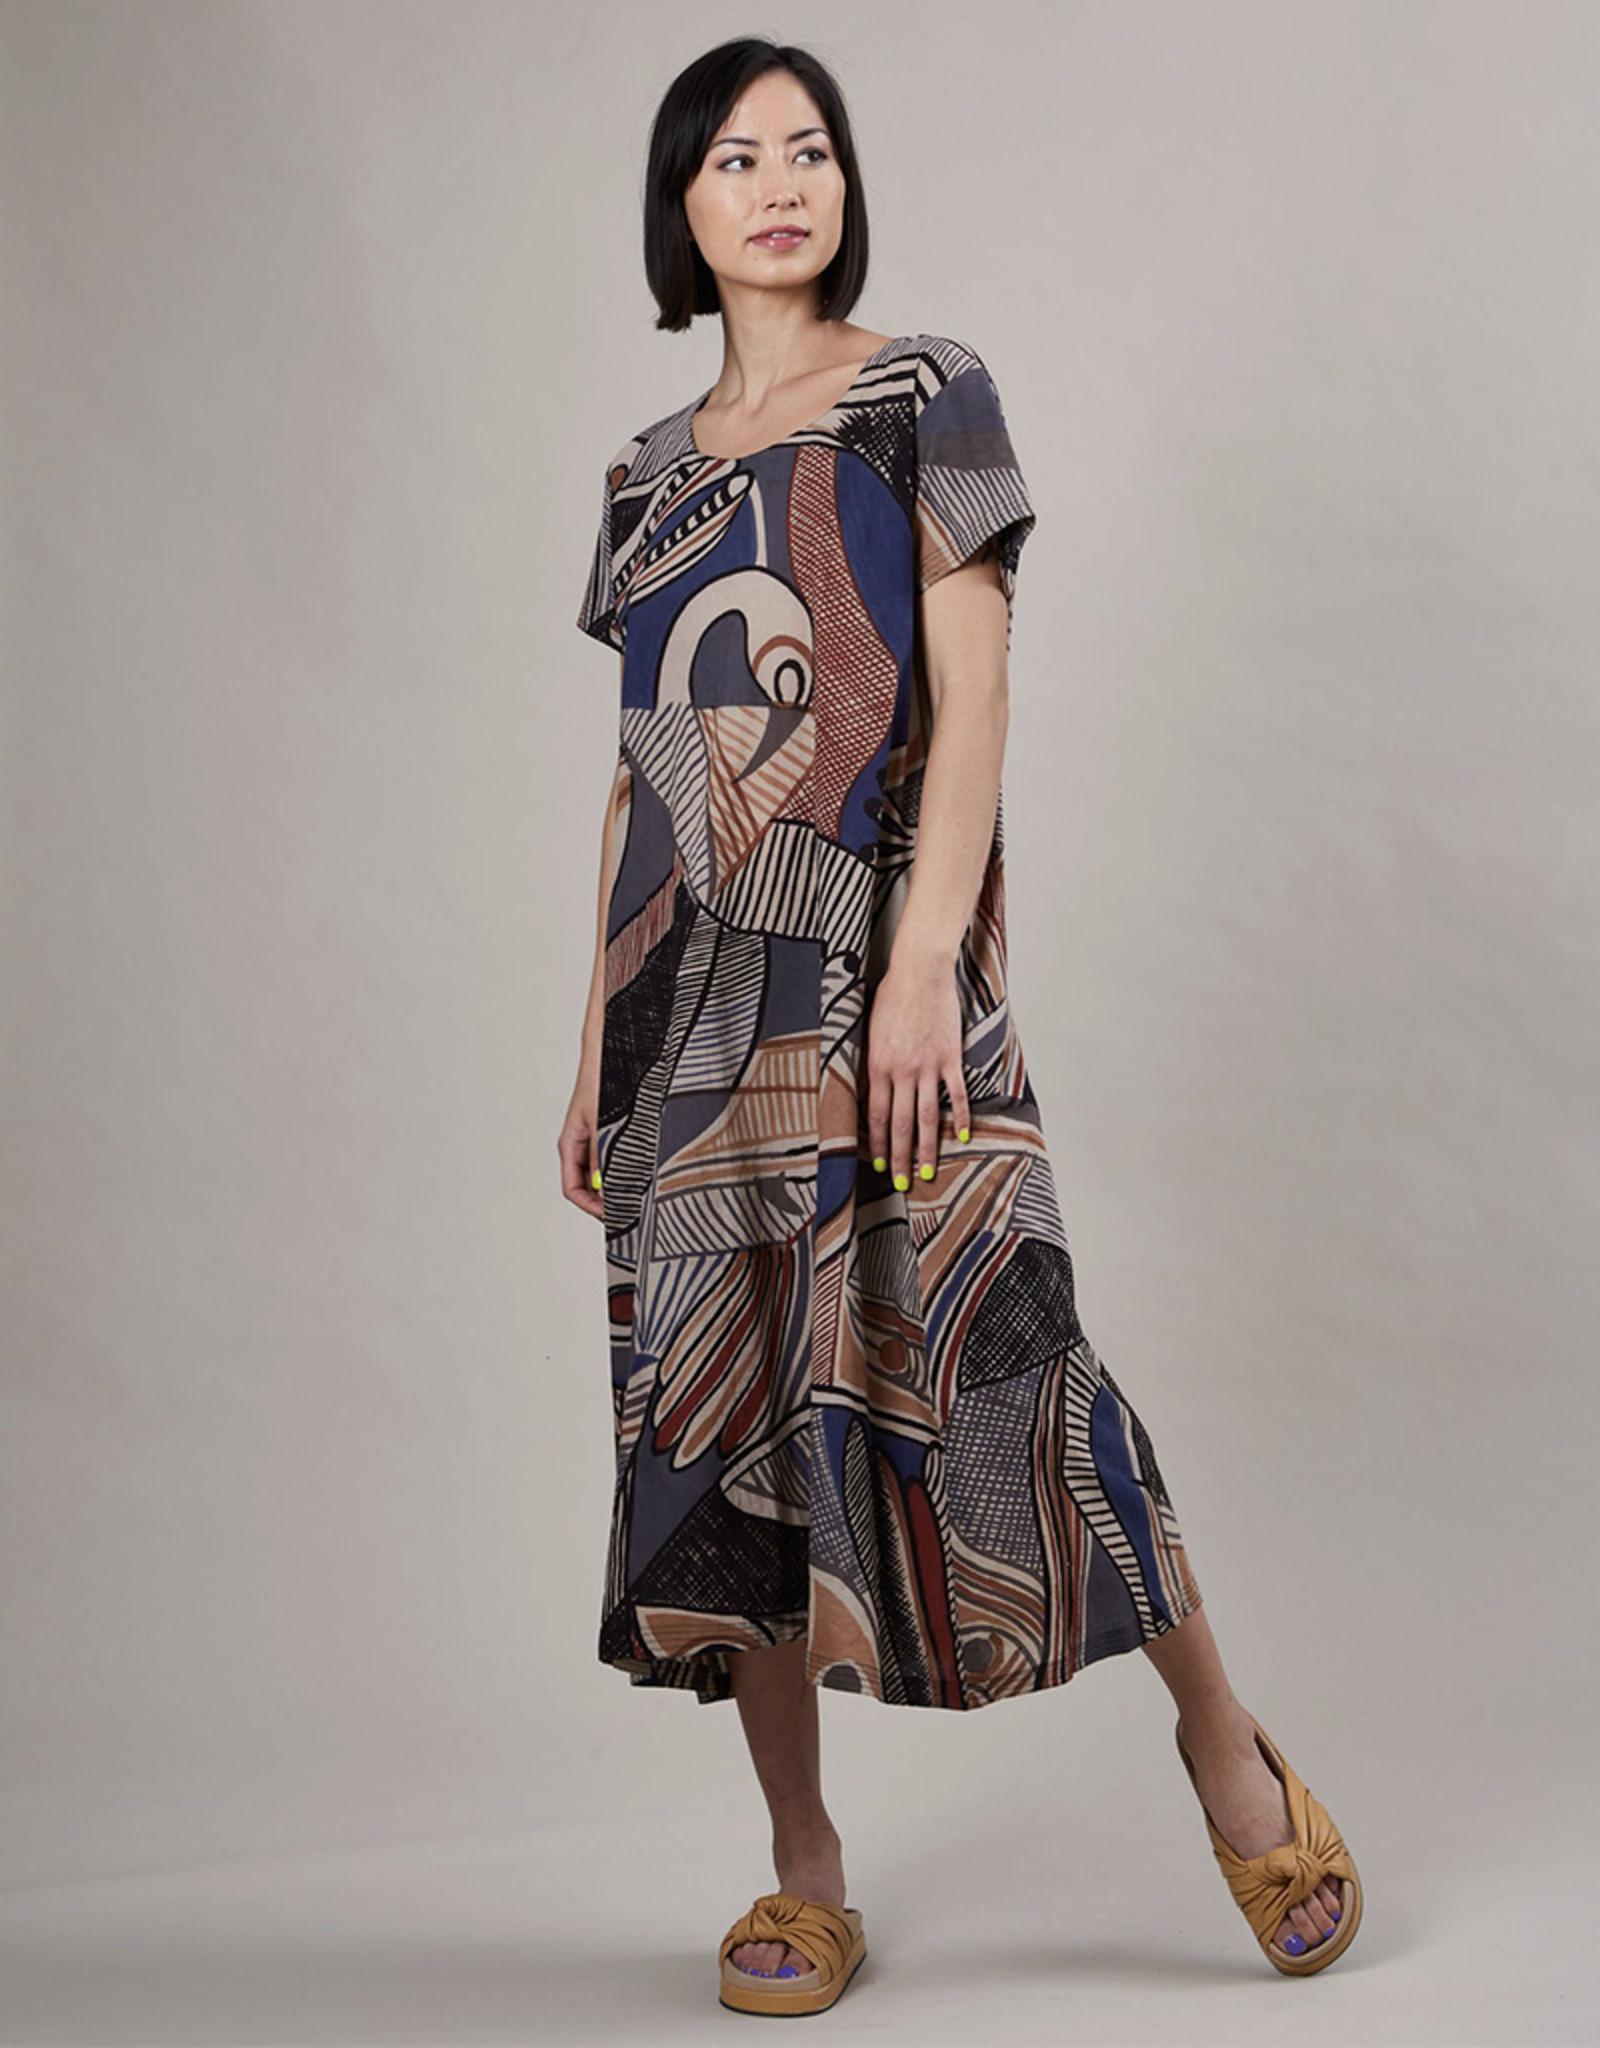 Haridra Hand Painted Dress Abstract 1